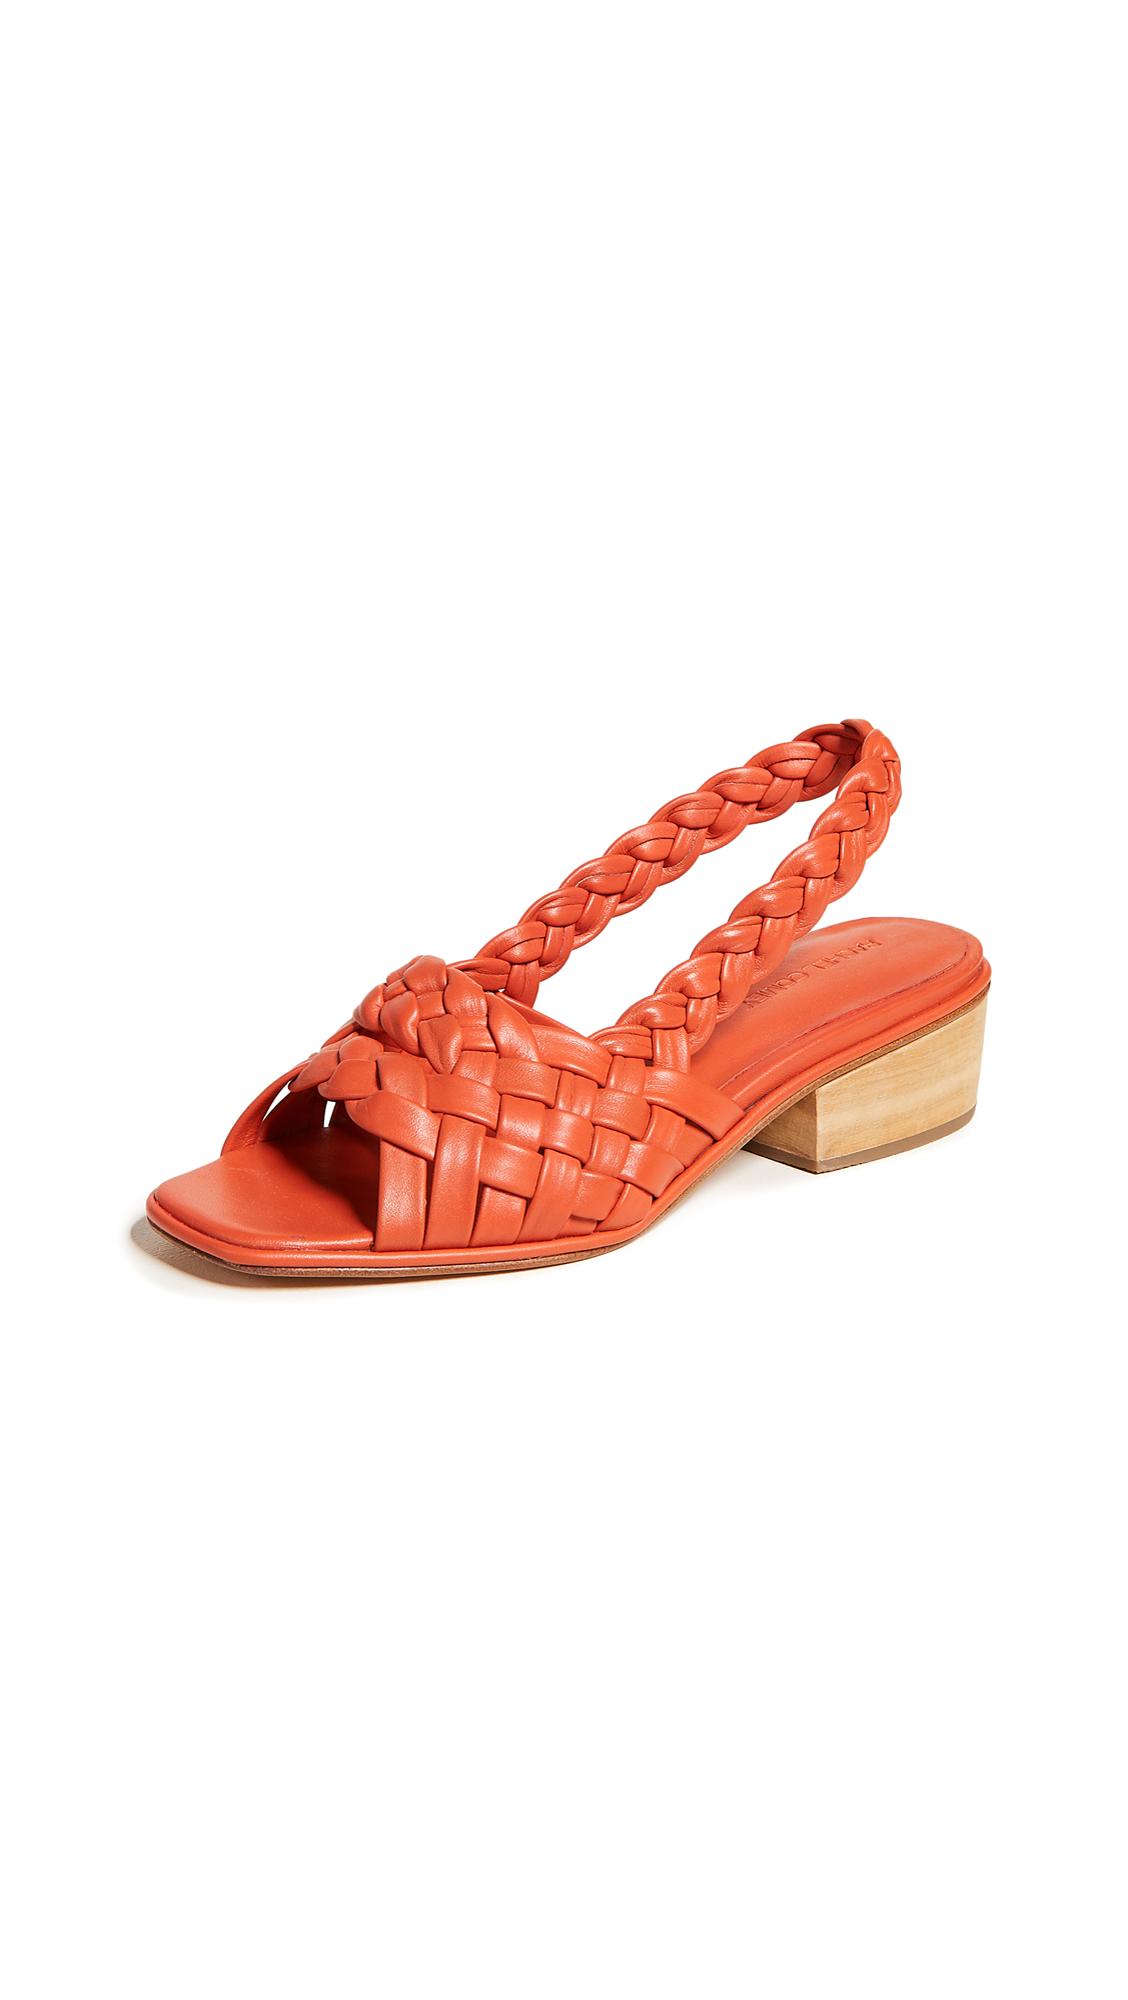 Rachel Comey Blanca Slingback Sandals - Poppy